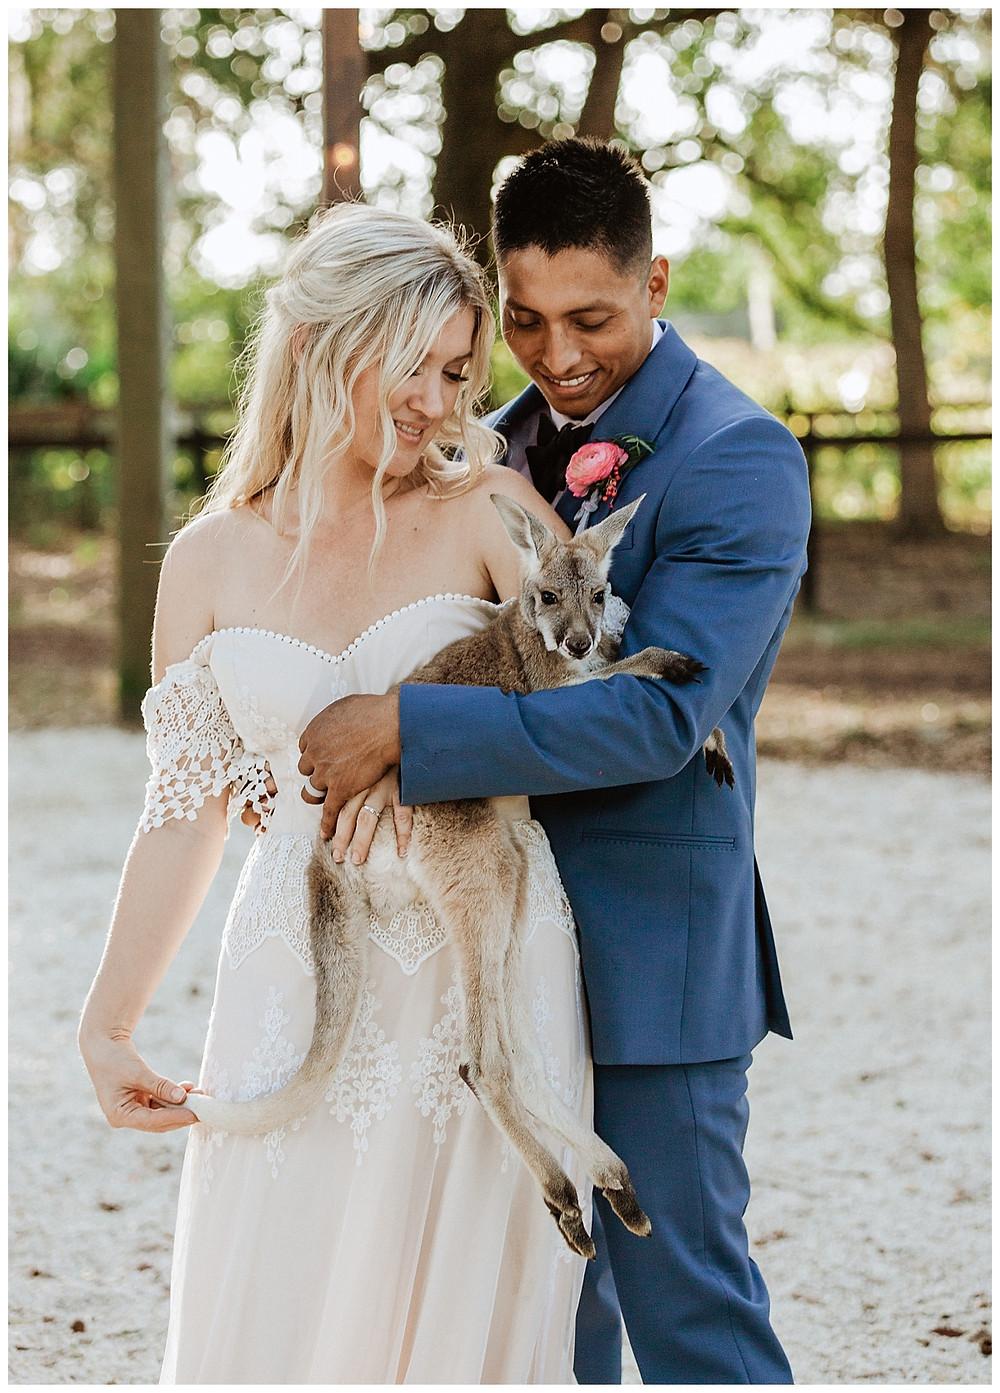 Boho Bride & Groom Portraits with Baby Kangaroo at Enchanted Oaks Farms, Ocala Florida